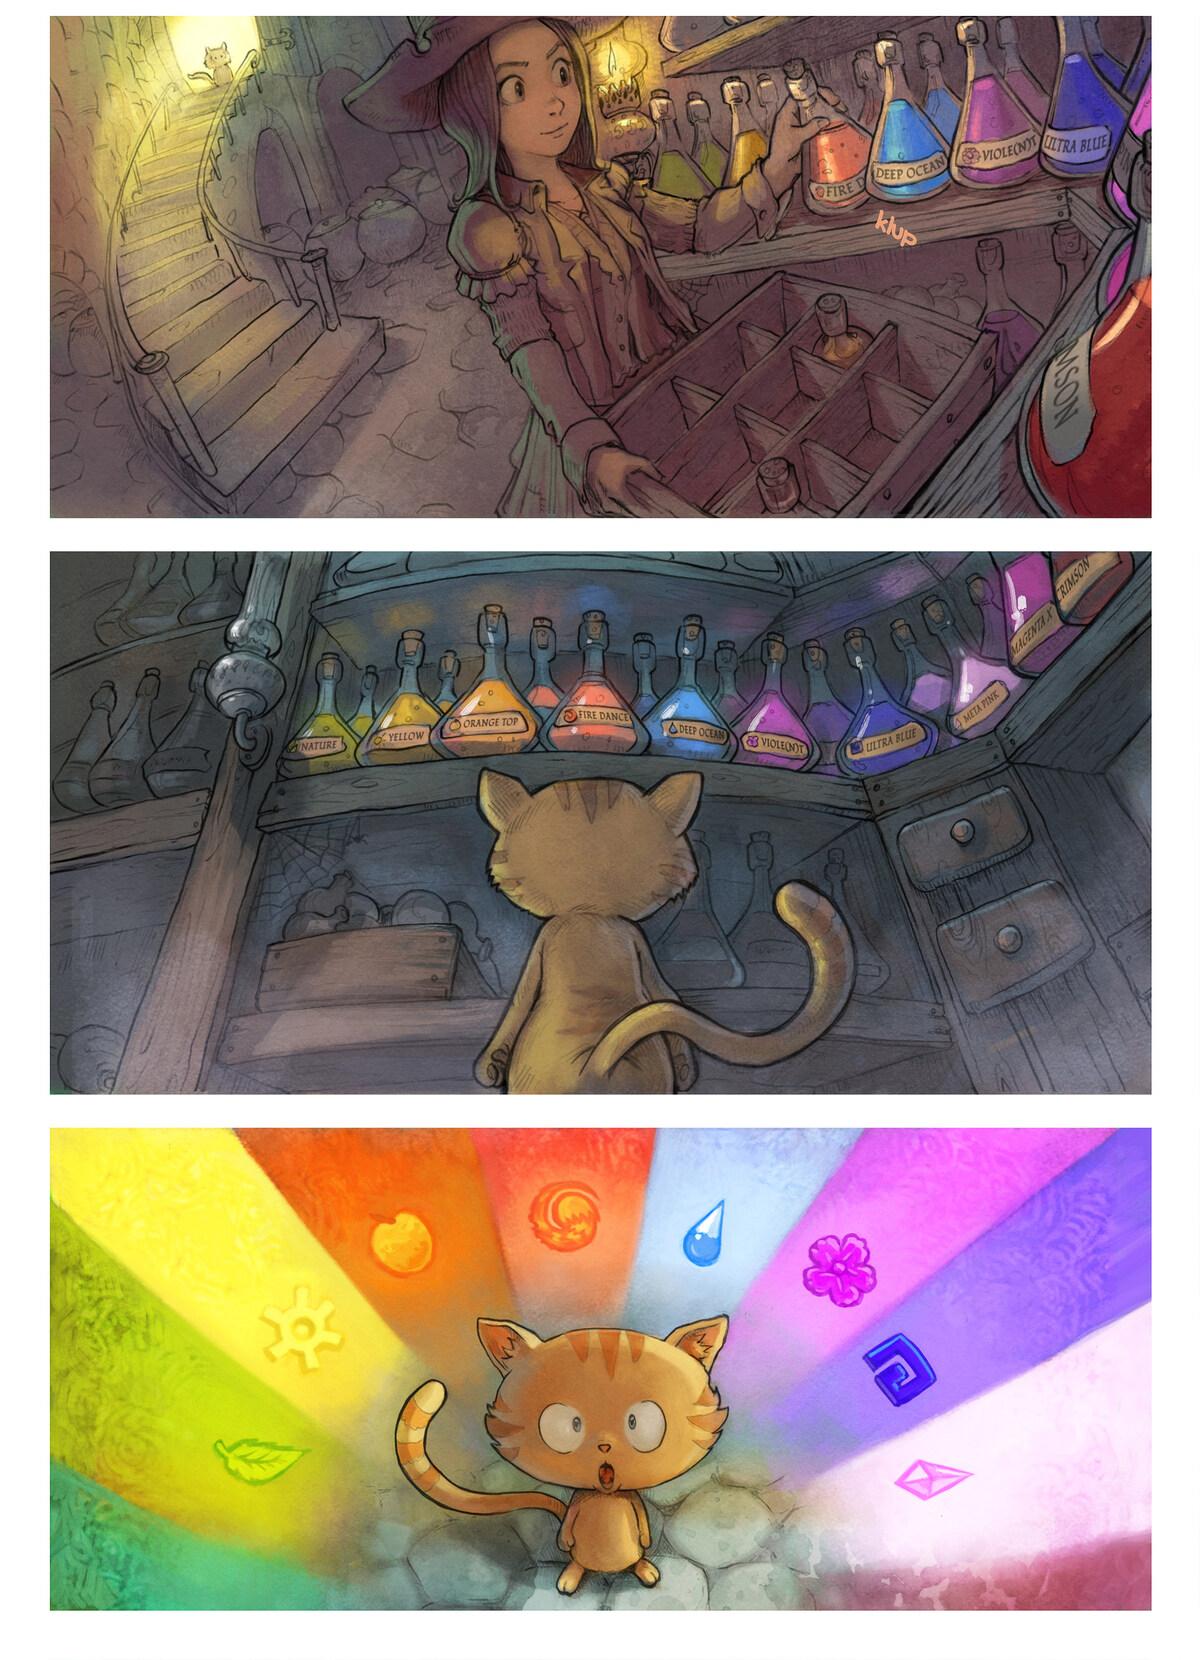 A webcomic page of Pepper&Carrot, tajla 2 [sz], strōna 2